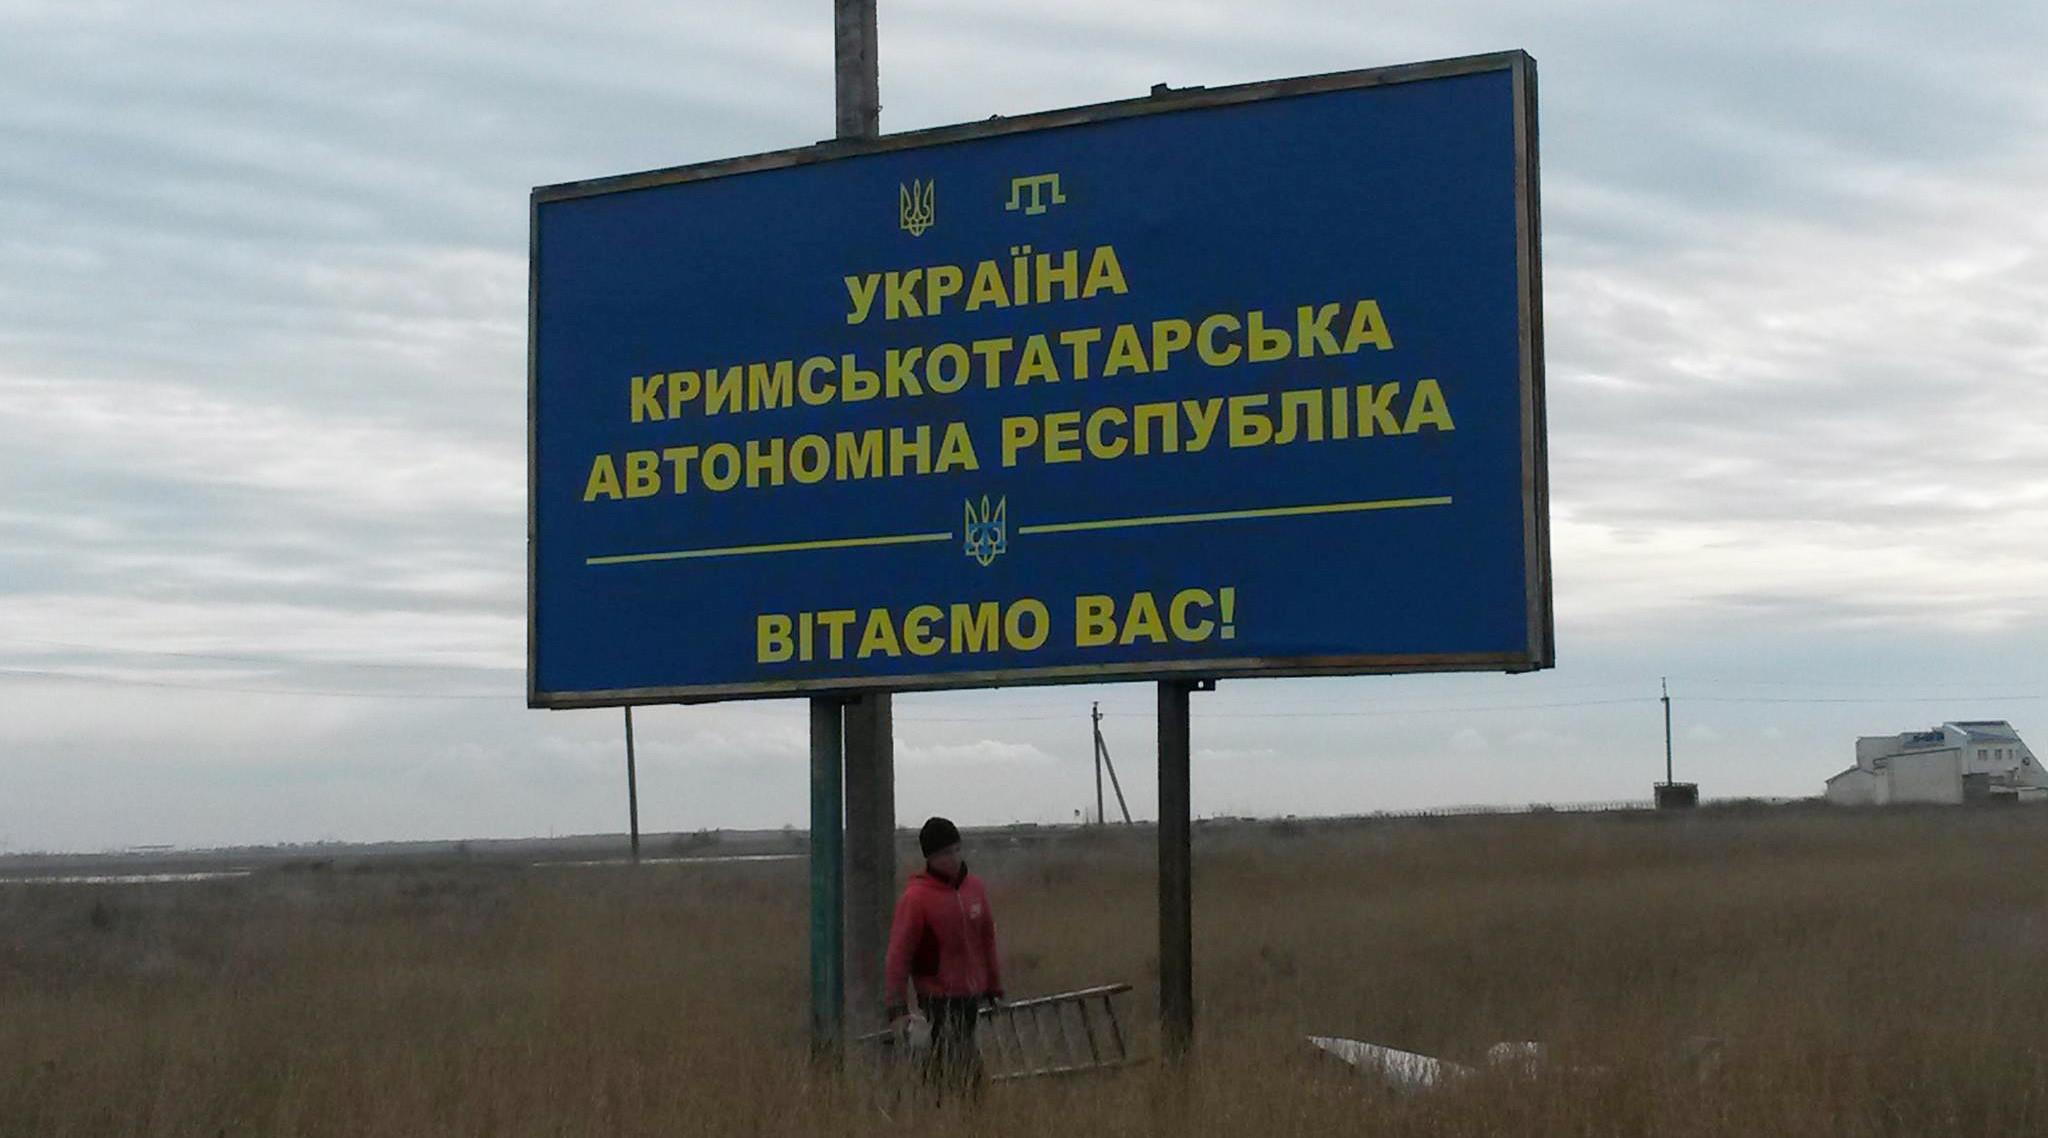 "<p>Фото: &copy;&nbsp;<a href=""https://www.facebook.com/434889093378005/photos/a.436014053265509.1073741829.434889093378005/476357195897861/?type=1&amp;theater"" target=""_blank"">facebook.com/Гражданская Блокада Крыма</a></p>"